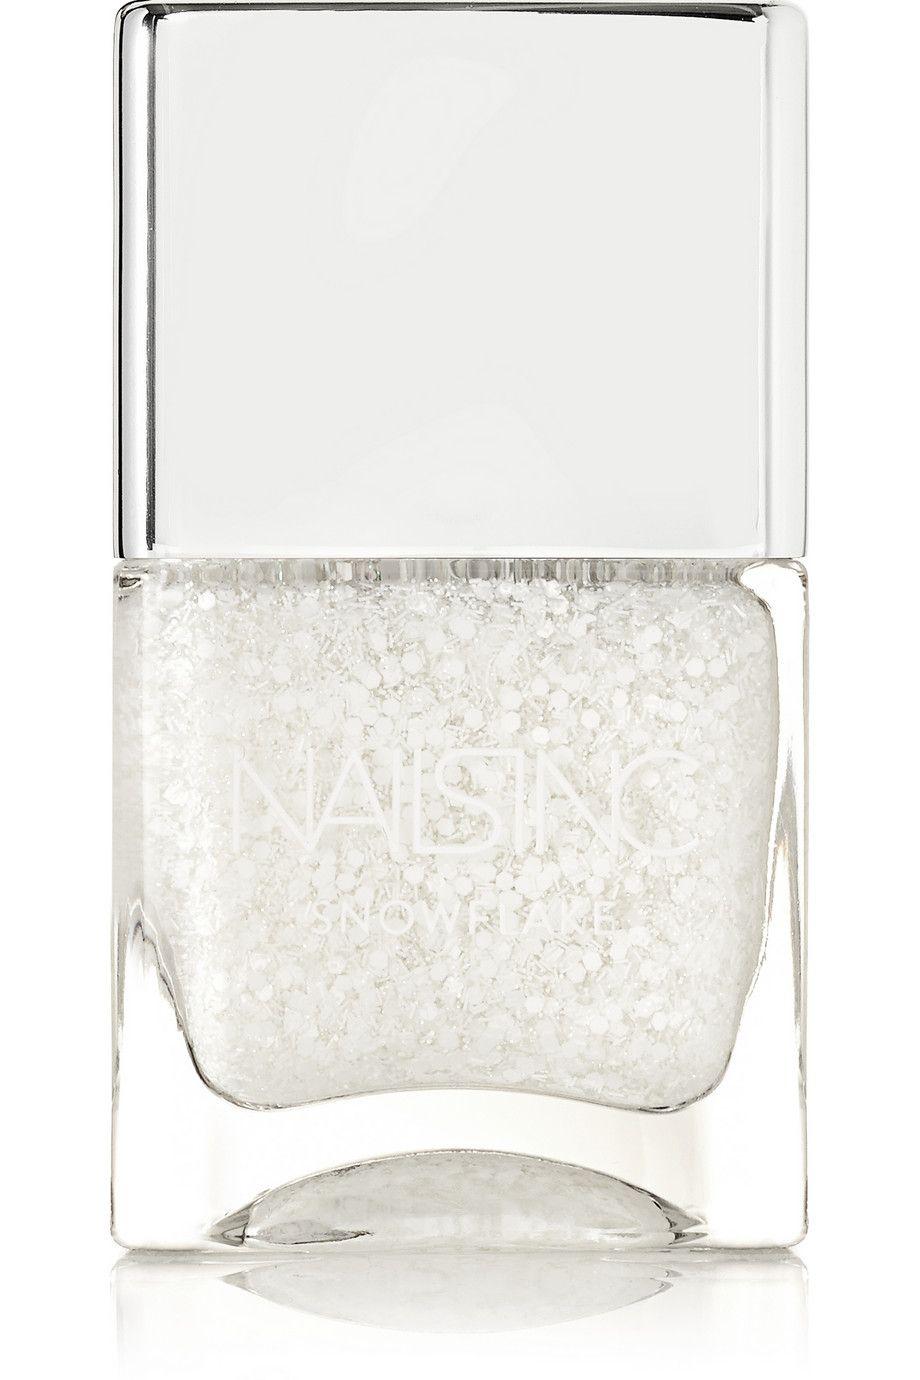 NAILS INC Nail Polish - Kensington Church Street Snowflake €17